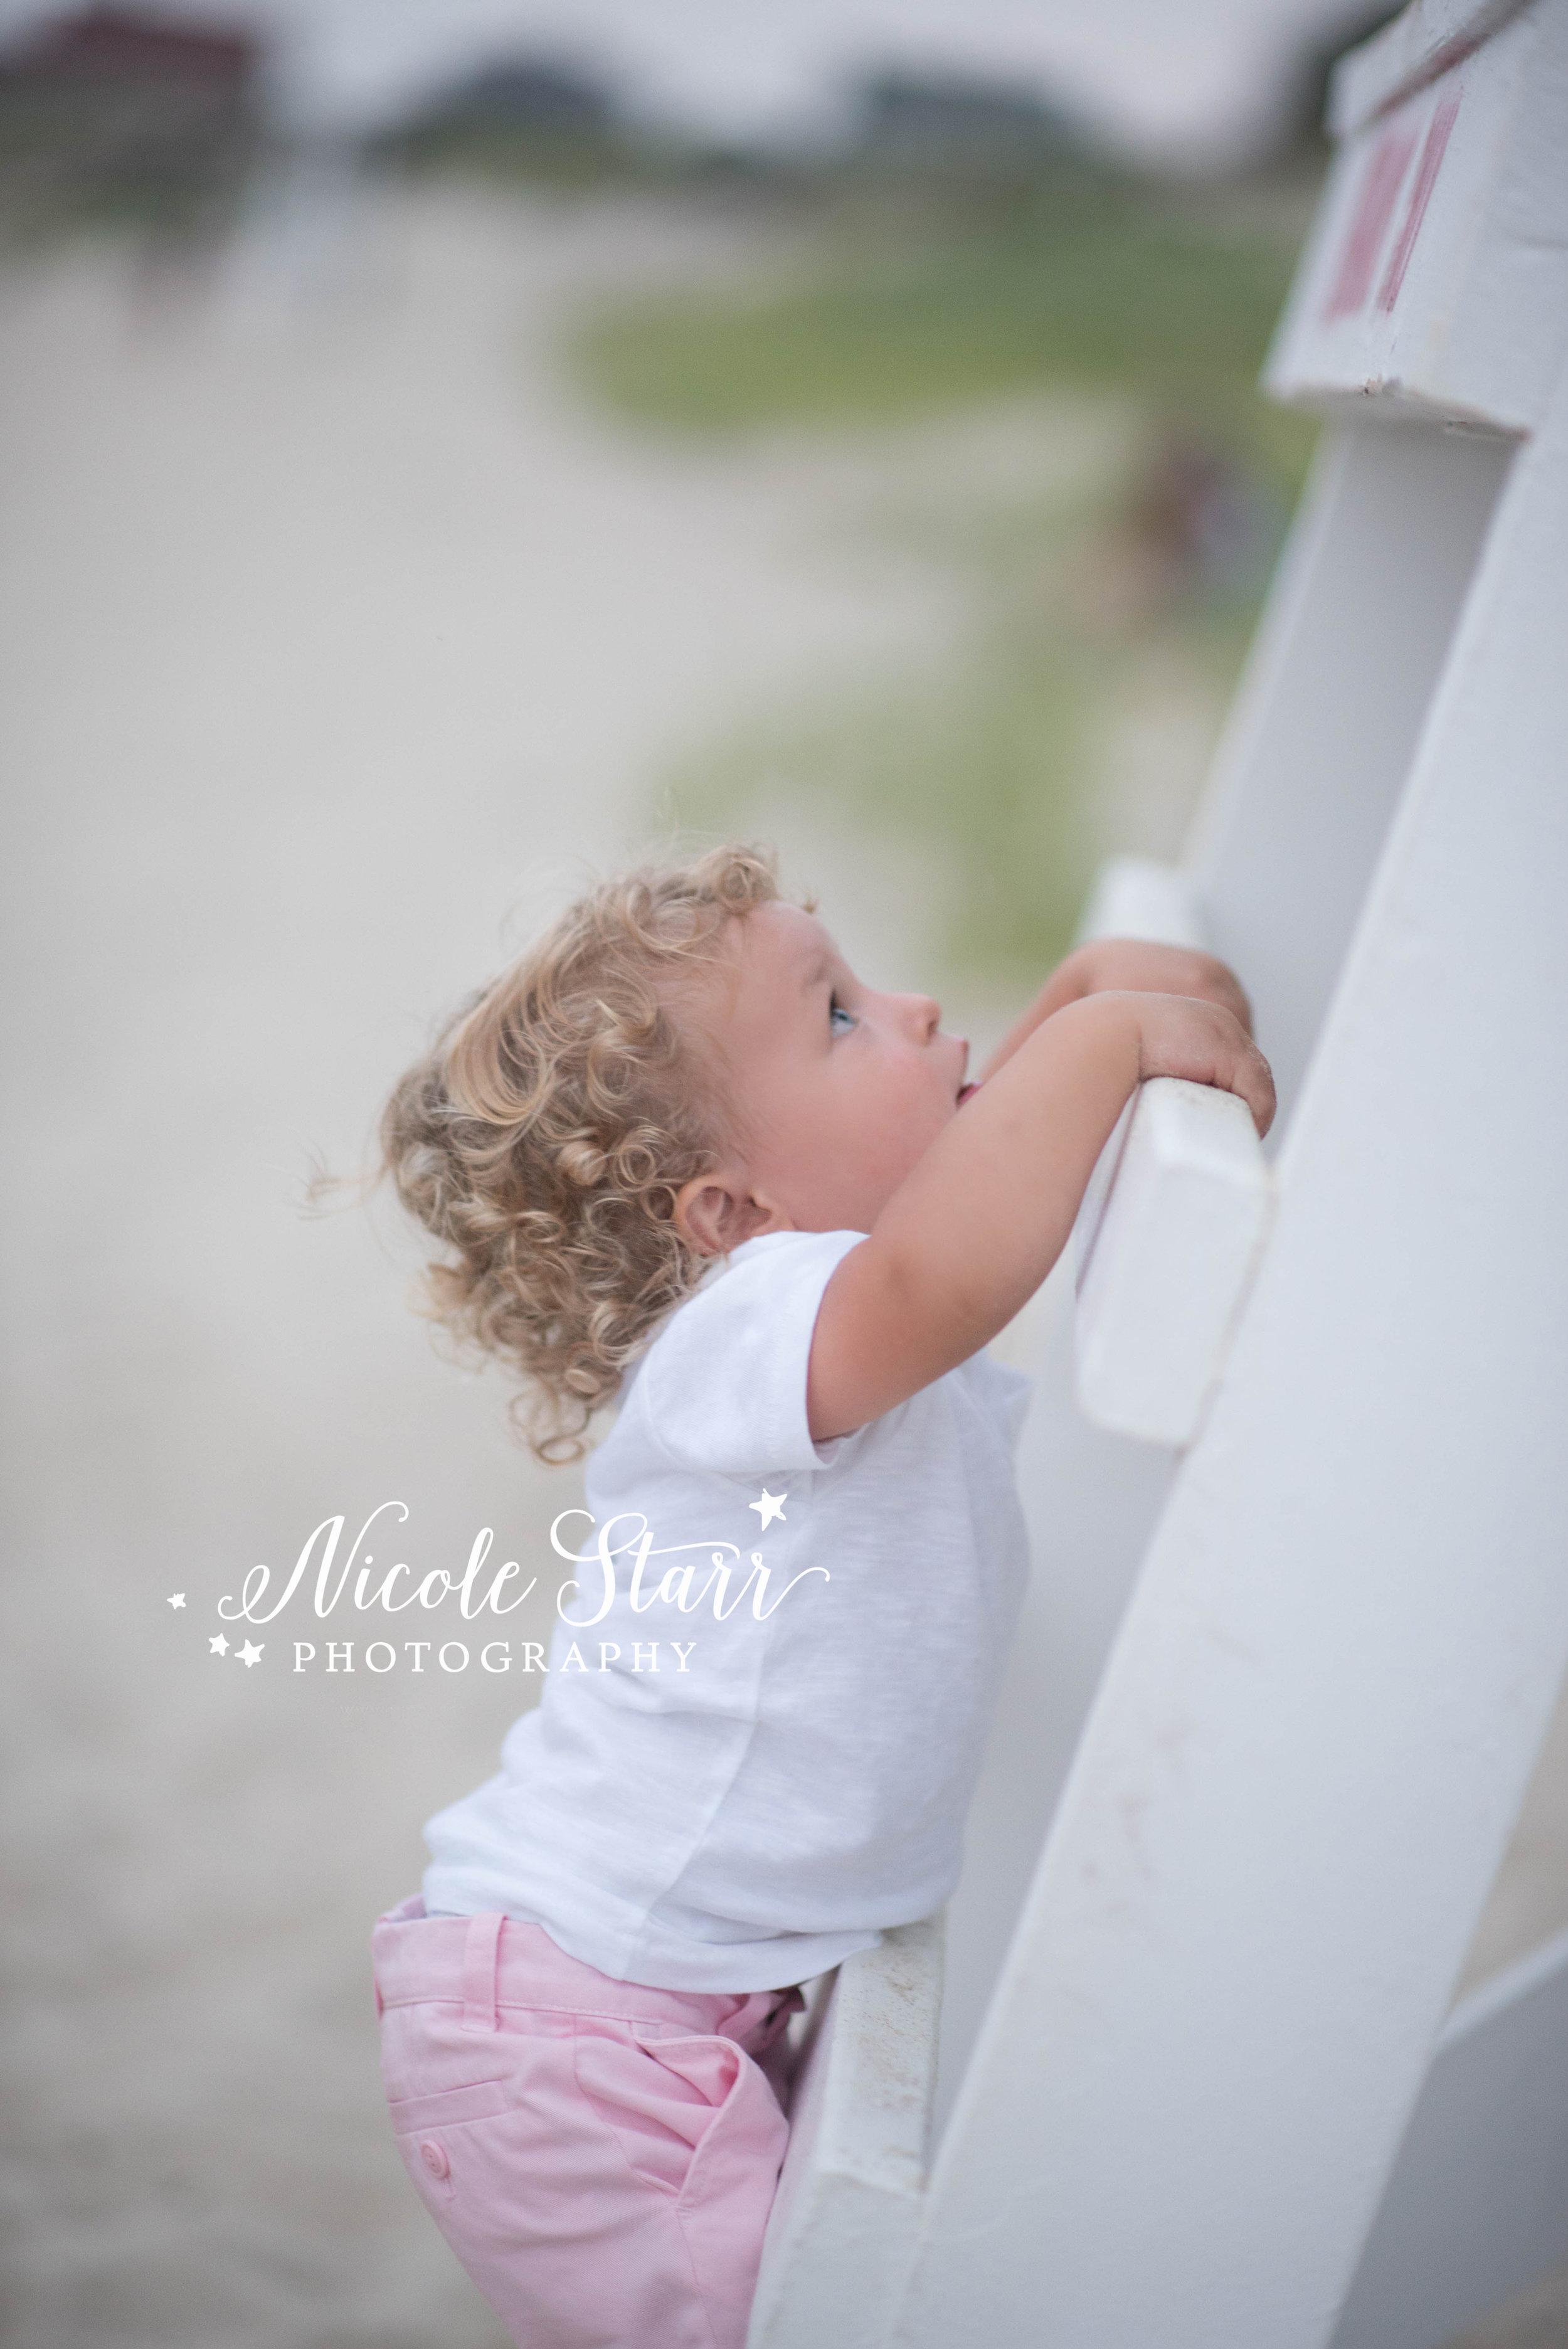 Nicole Starr Photography | Cape Cod Family Photographer | Boston Family Photographer | Family Photographer